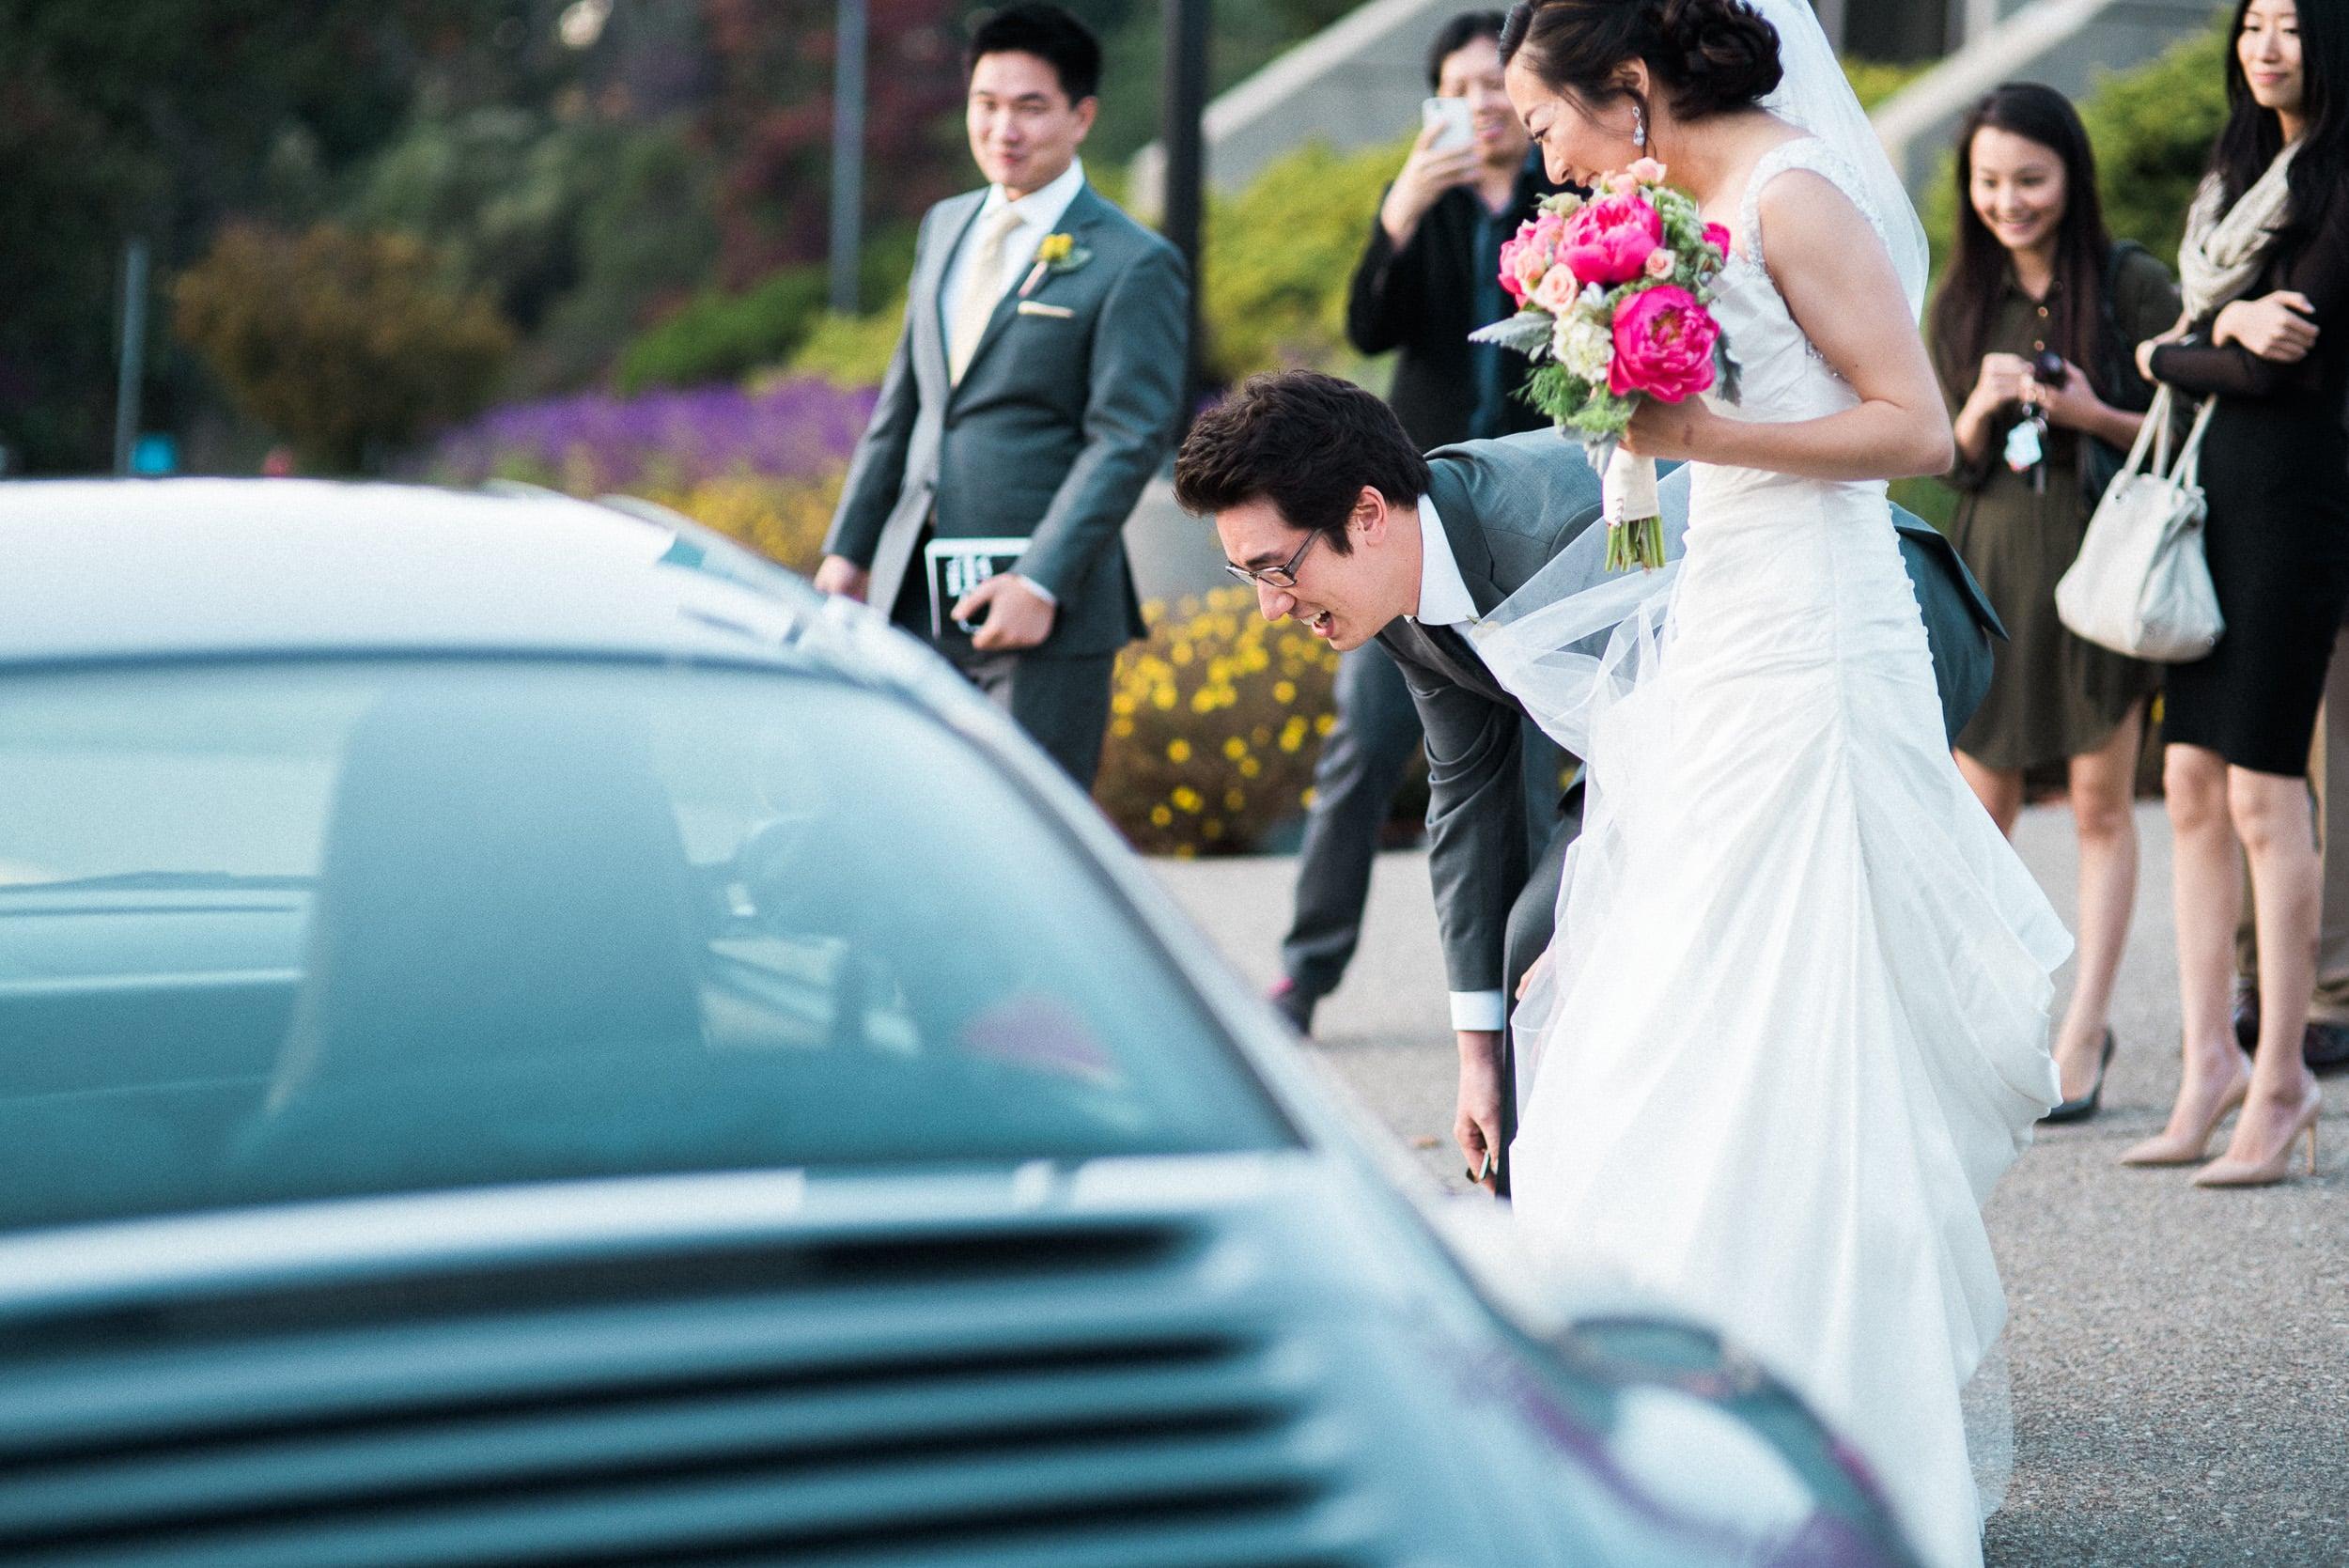 Moraga Valley Church wedding 057.jpg